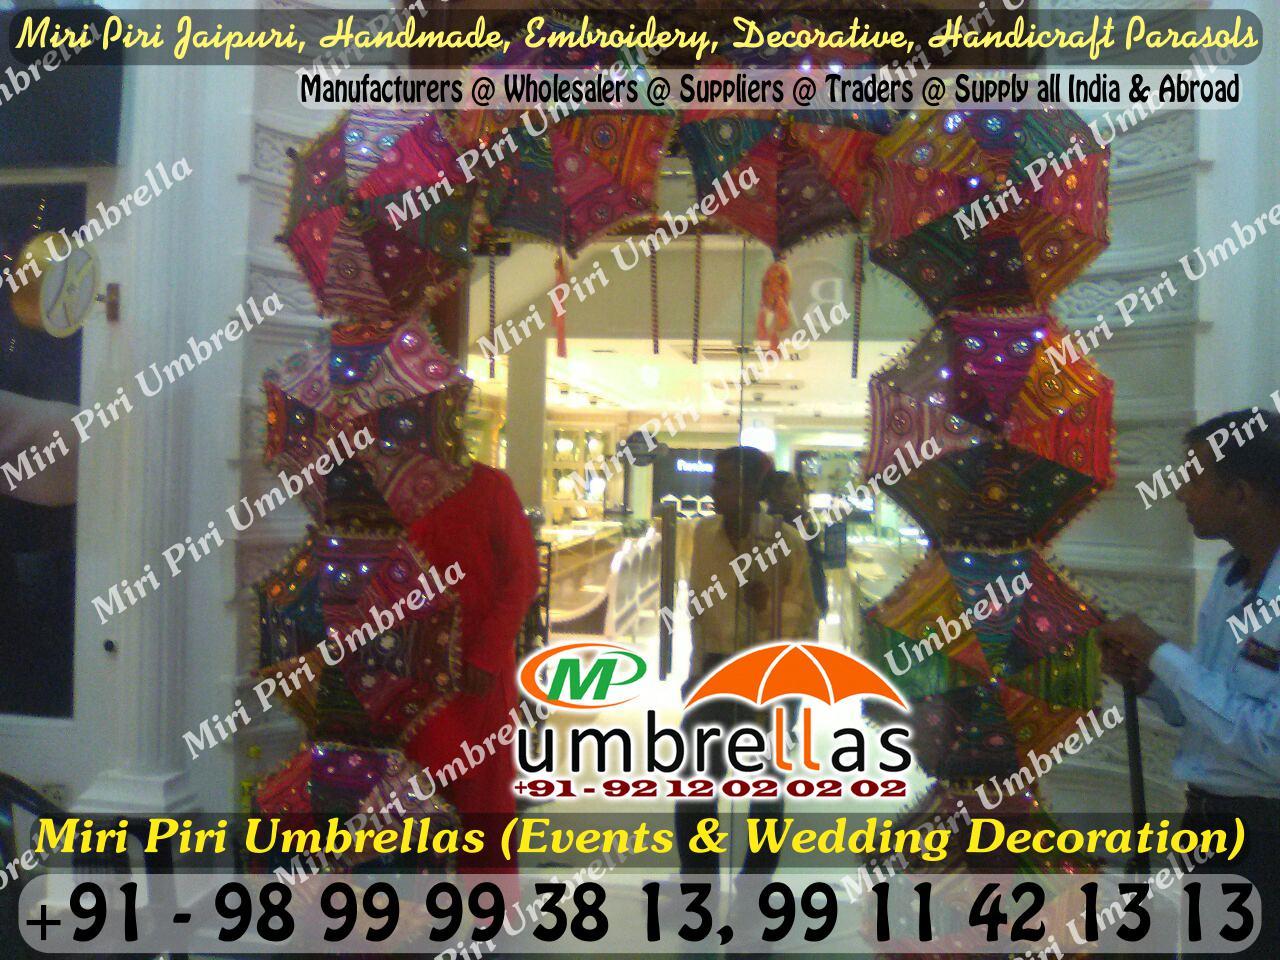 Wedding umbrellas parasols manufacturers suppliers wholesalers rajasthani umbrella manufacturers suppliers in delhi india rajasthan jaipur ahmedabad gujarat junglespirit Choice Image